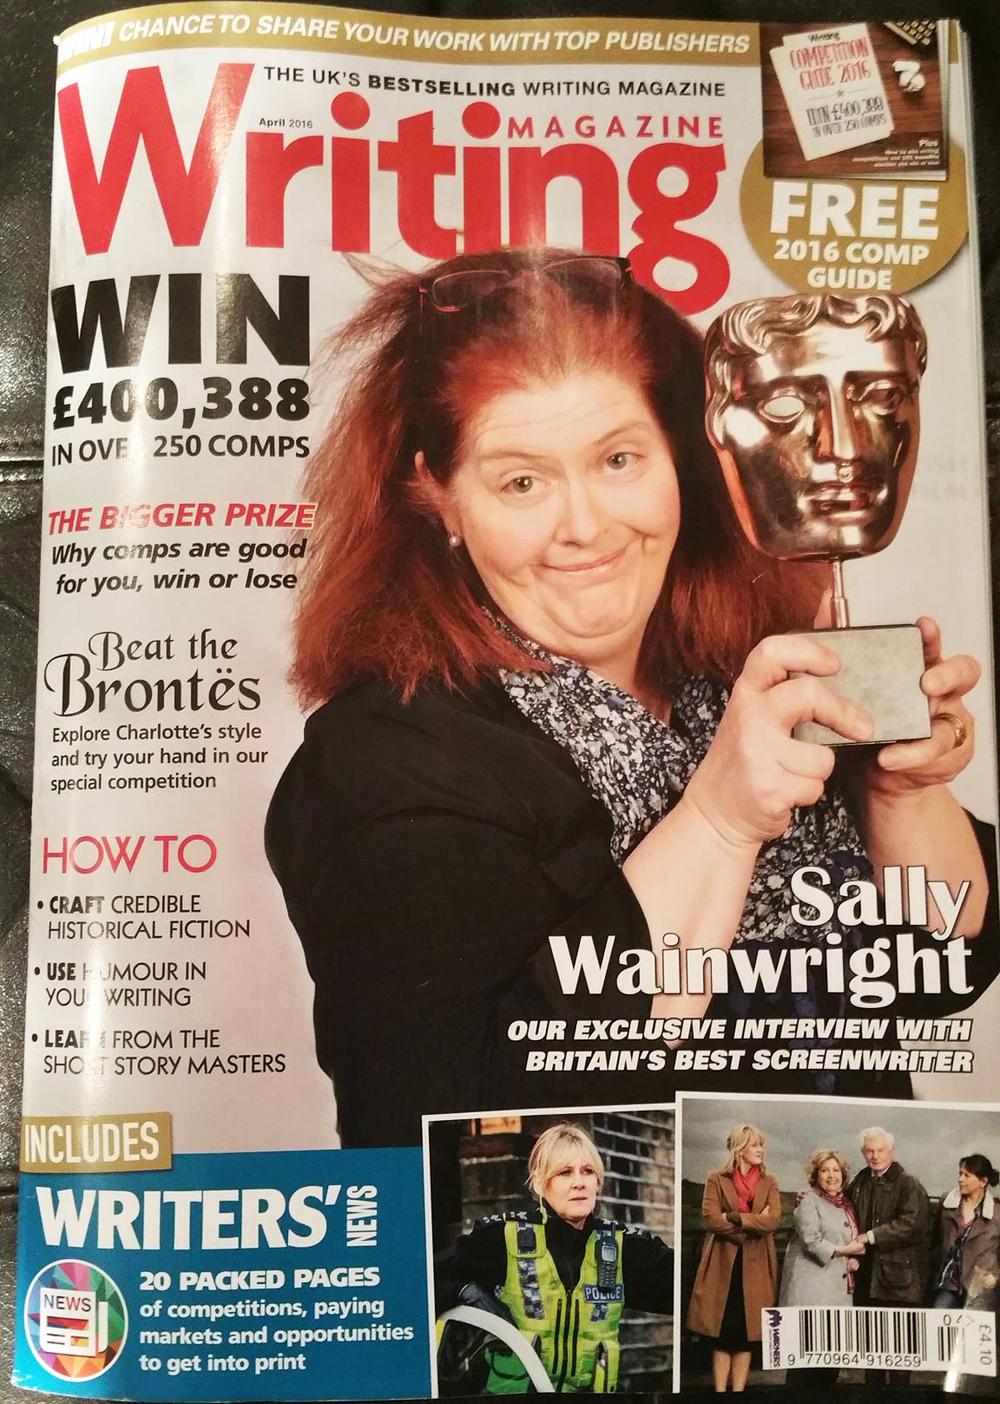 Writing Magazine April 2016.jpg